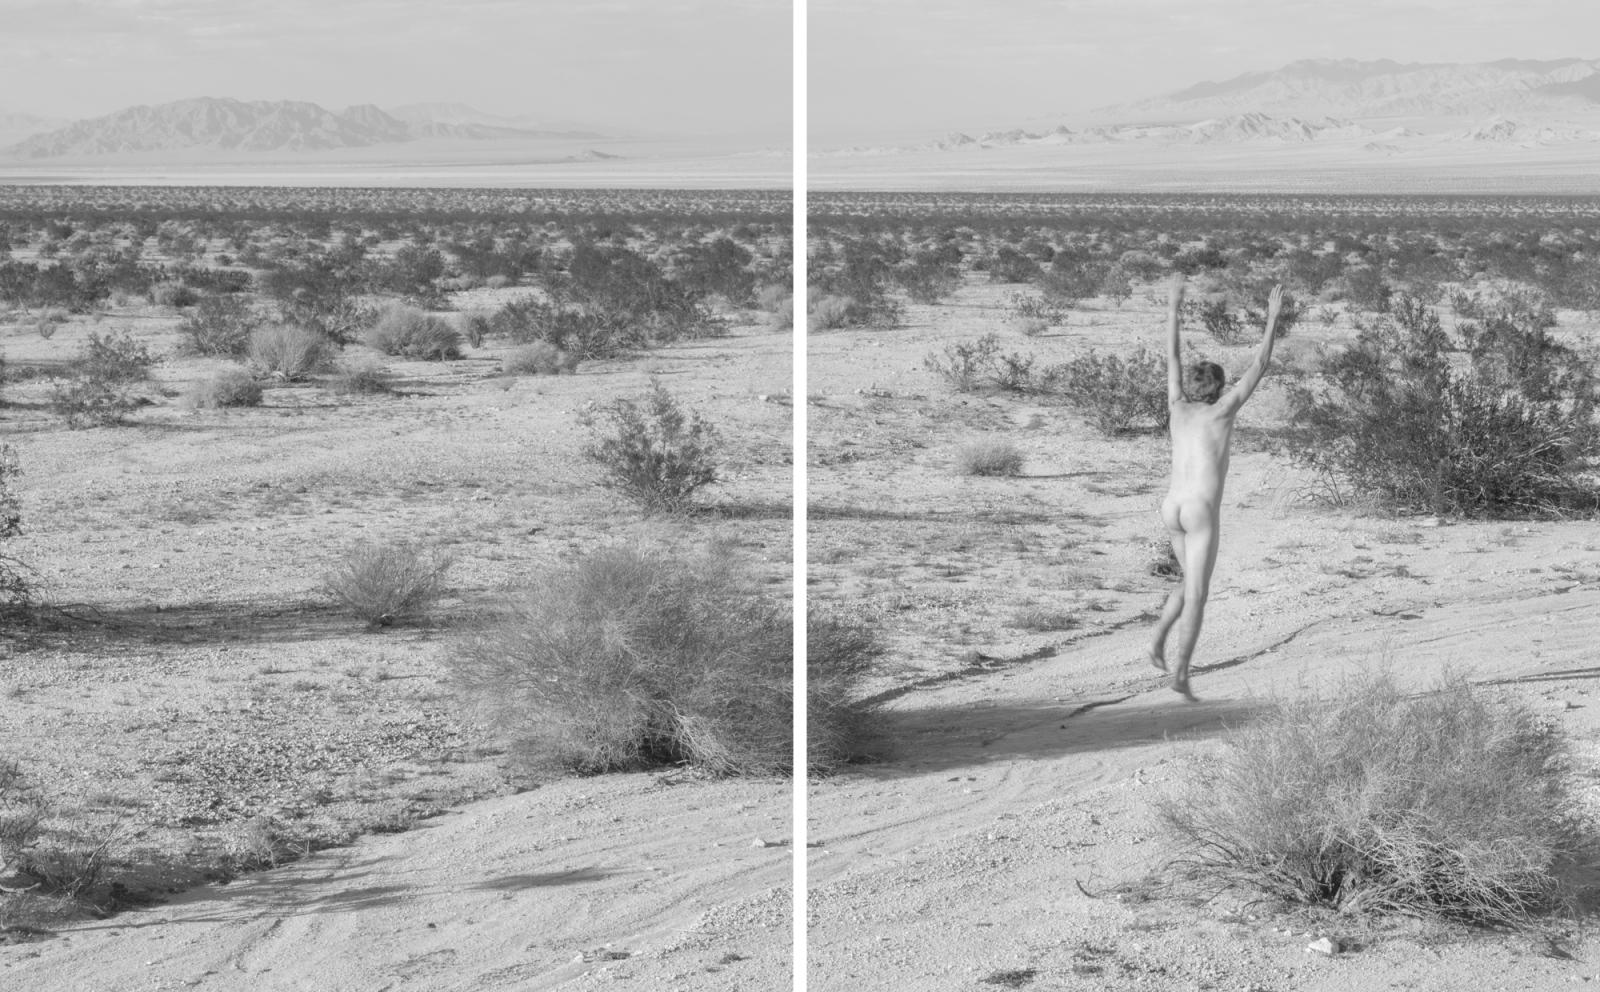 Art and Documentary Photography - Loading 2xdesertjump-3.jpg